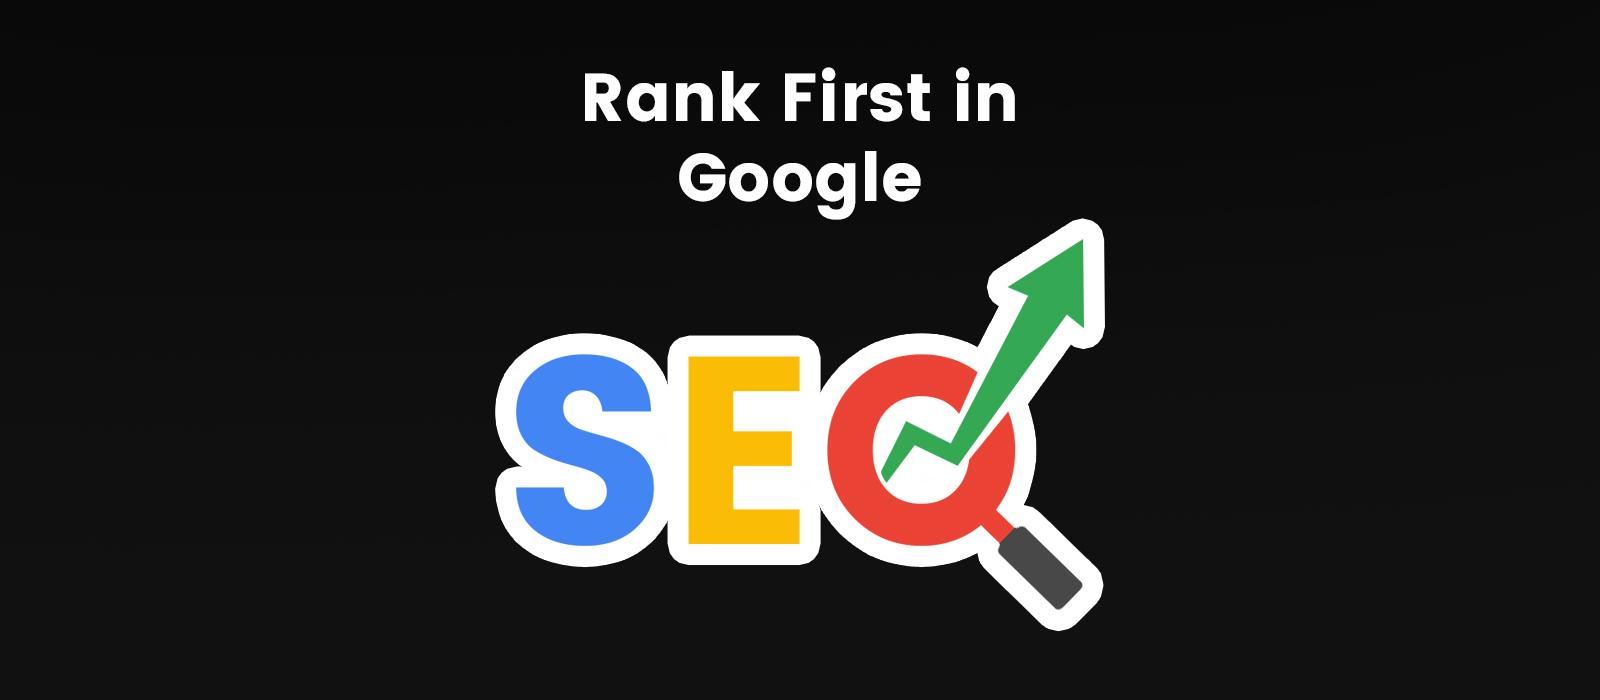 seo-search-engine-optimizationgoogle-course-digital-marketing-pouya-eti-2